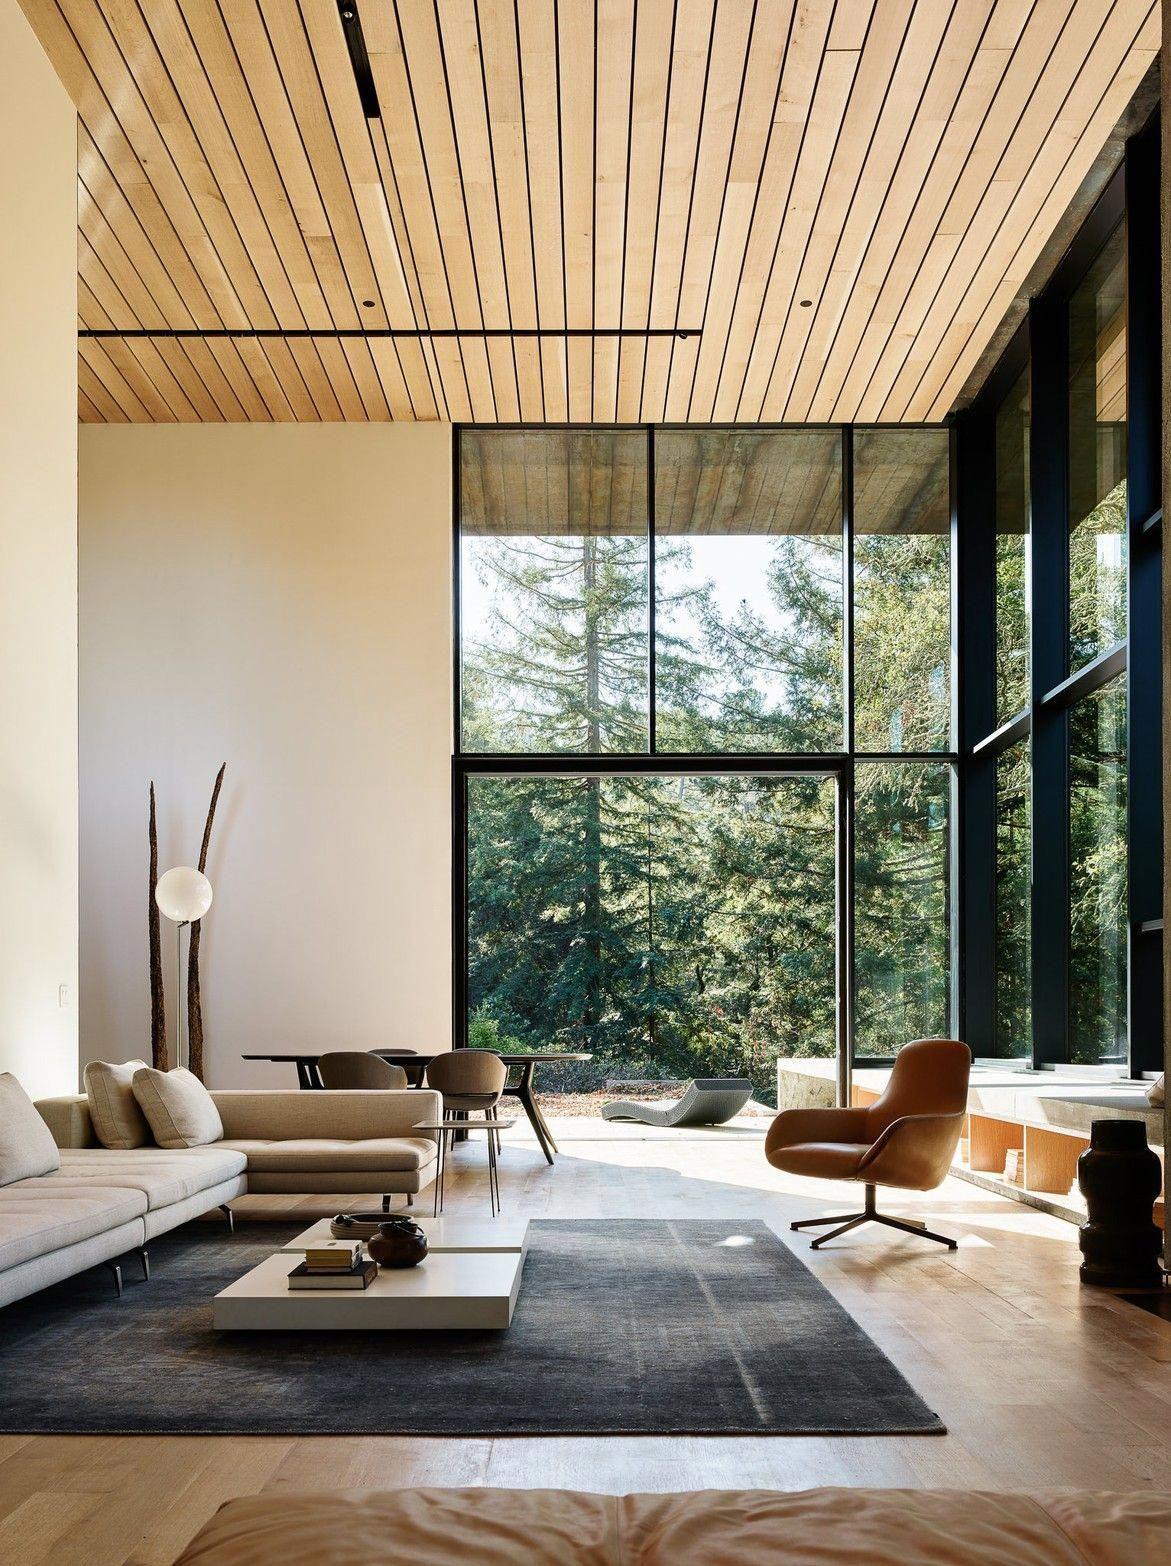 Miner road faulknerarchitects orinda iddesign apartment interior design modern best also by faulkner architects id rh pinterest